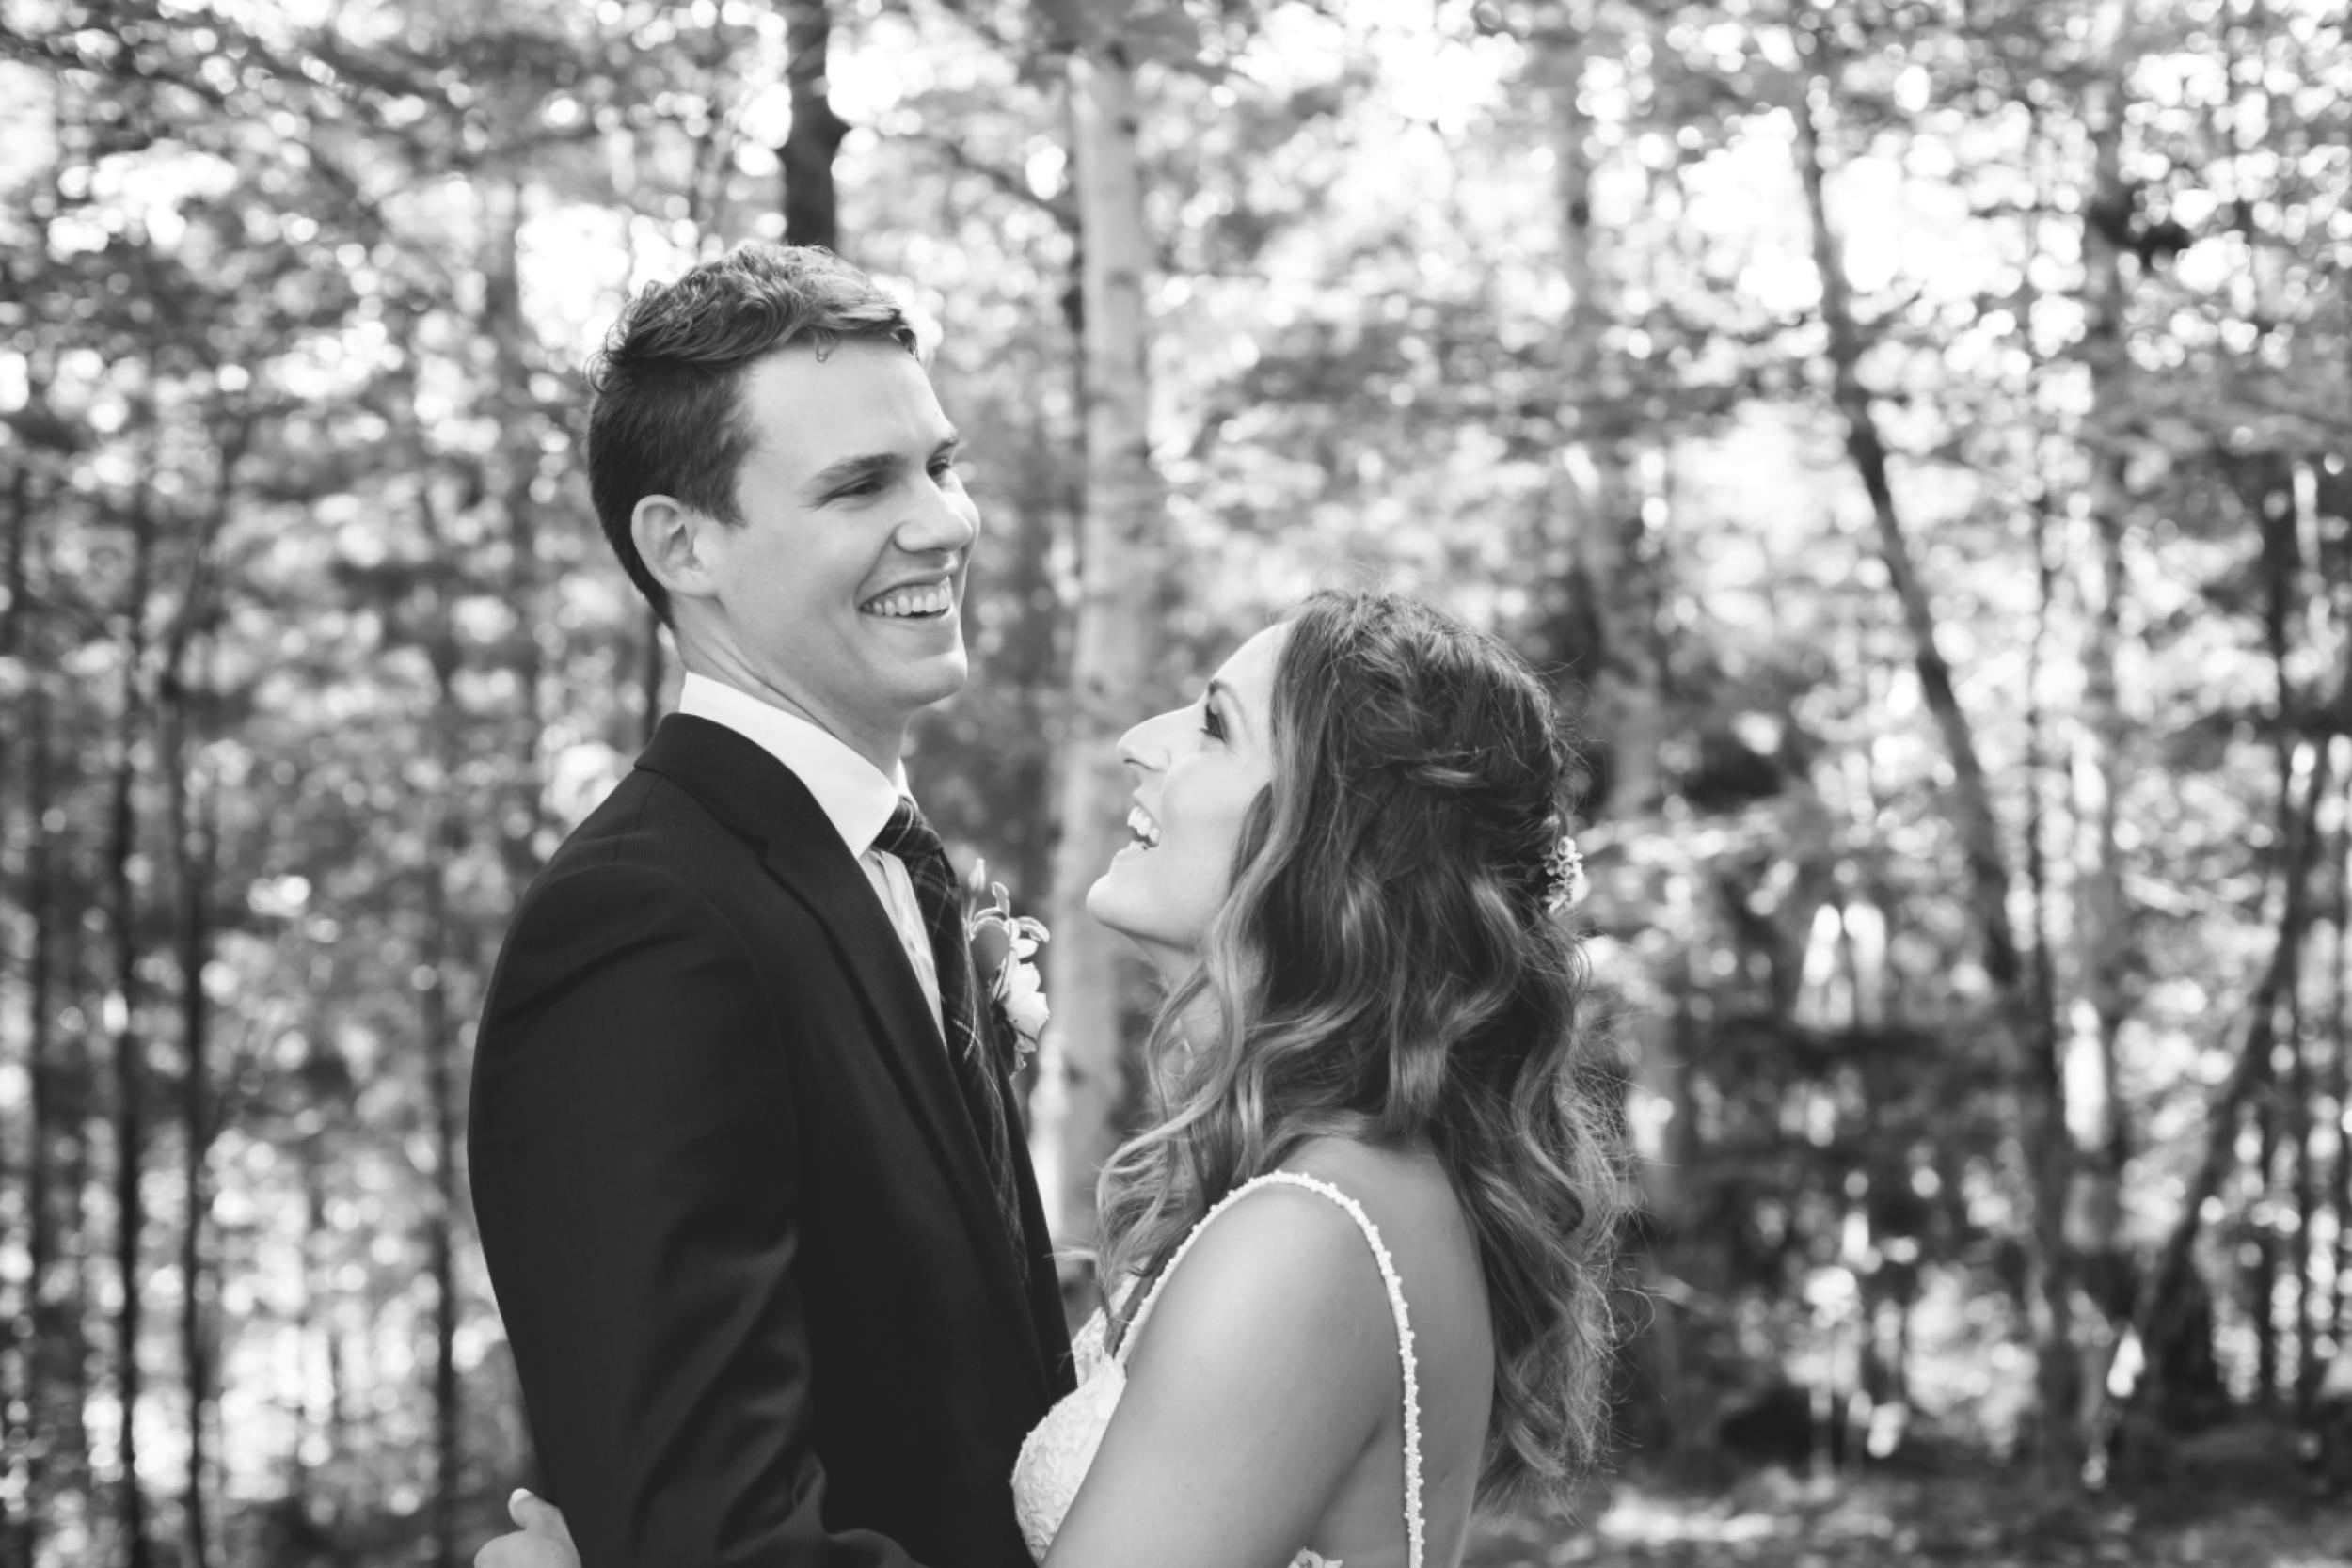 Wedding-Photos-Muskoka-Clevelands-House-Photographer-Wedding-Hamilton-GTA-Niagara-Oakville-Moments-by-Lauren-Photography-Photo-Image-39.png